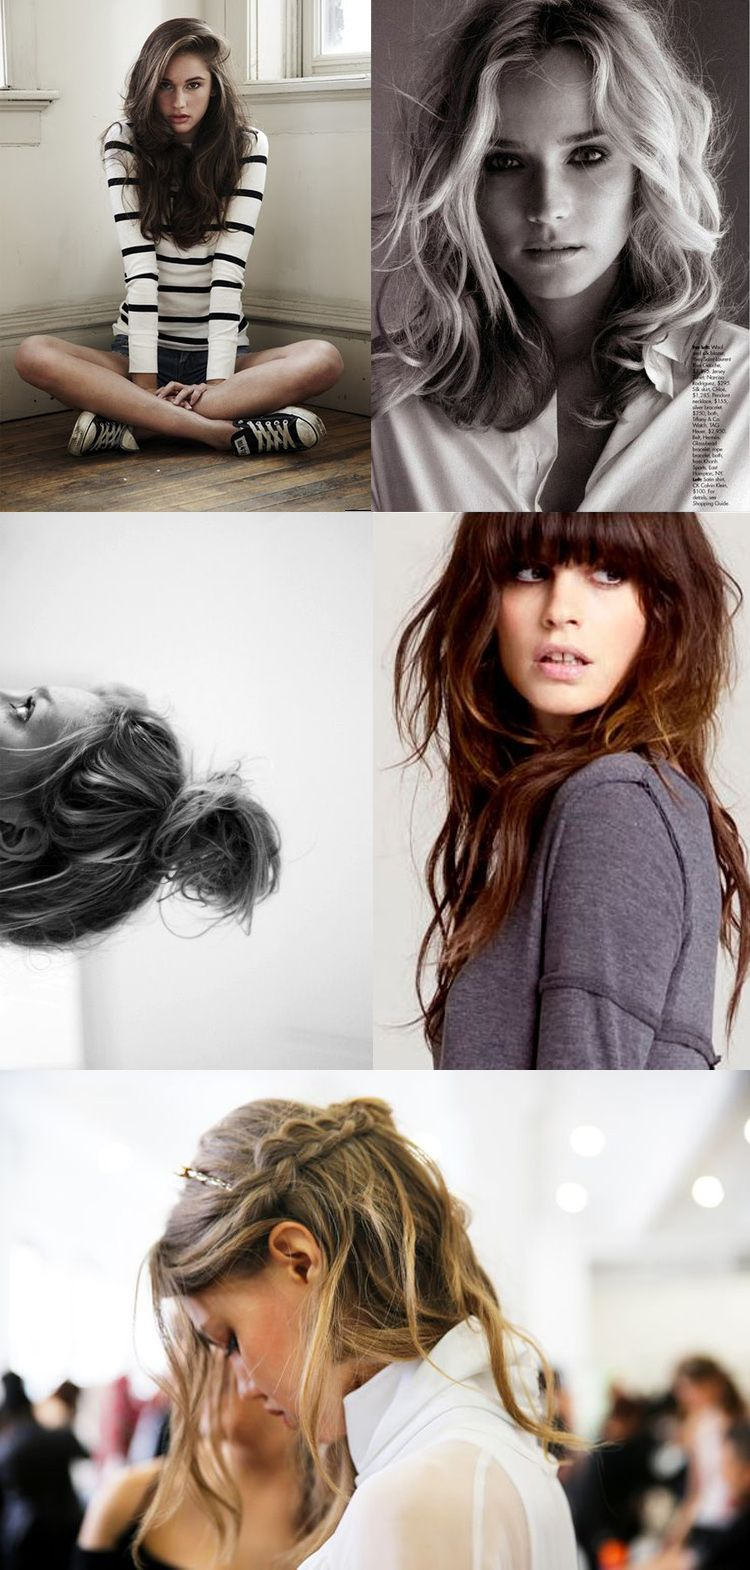 photo messy-hair-inspiration-4_zps08db2eb2.jpg